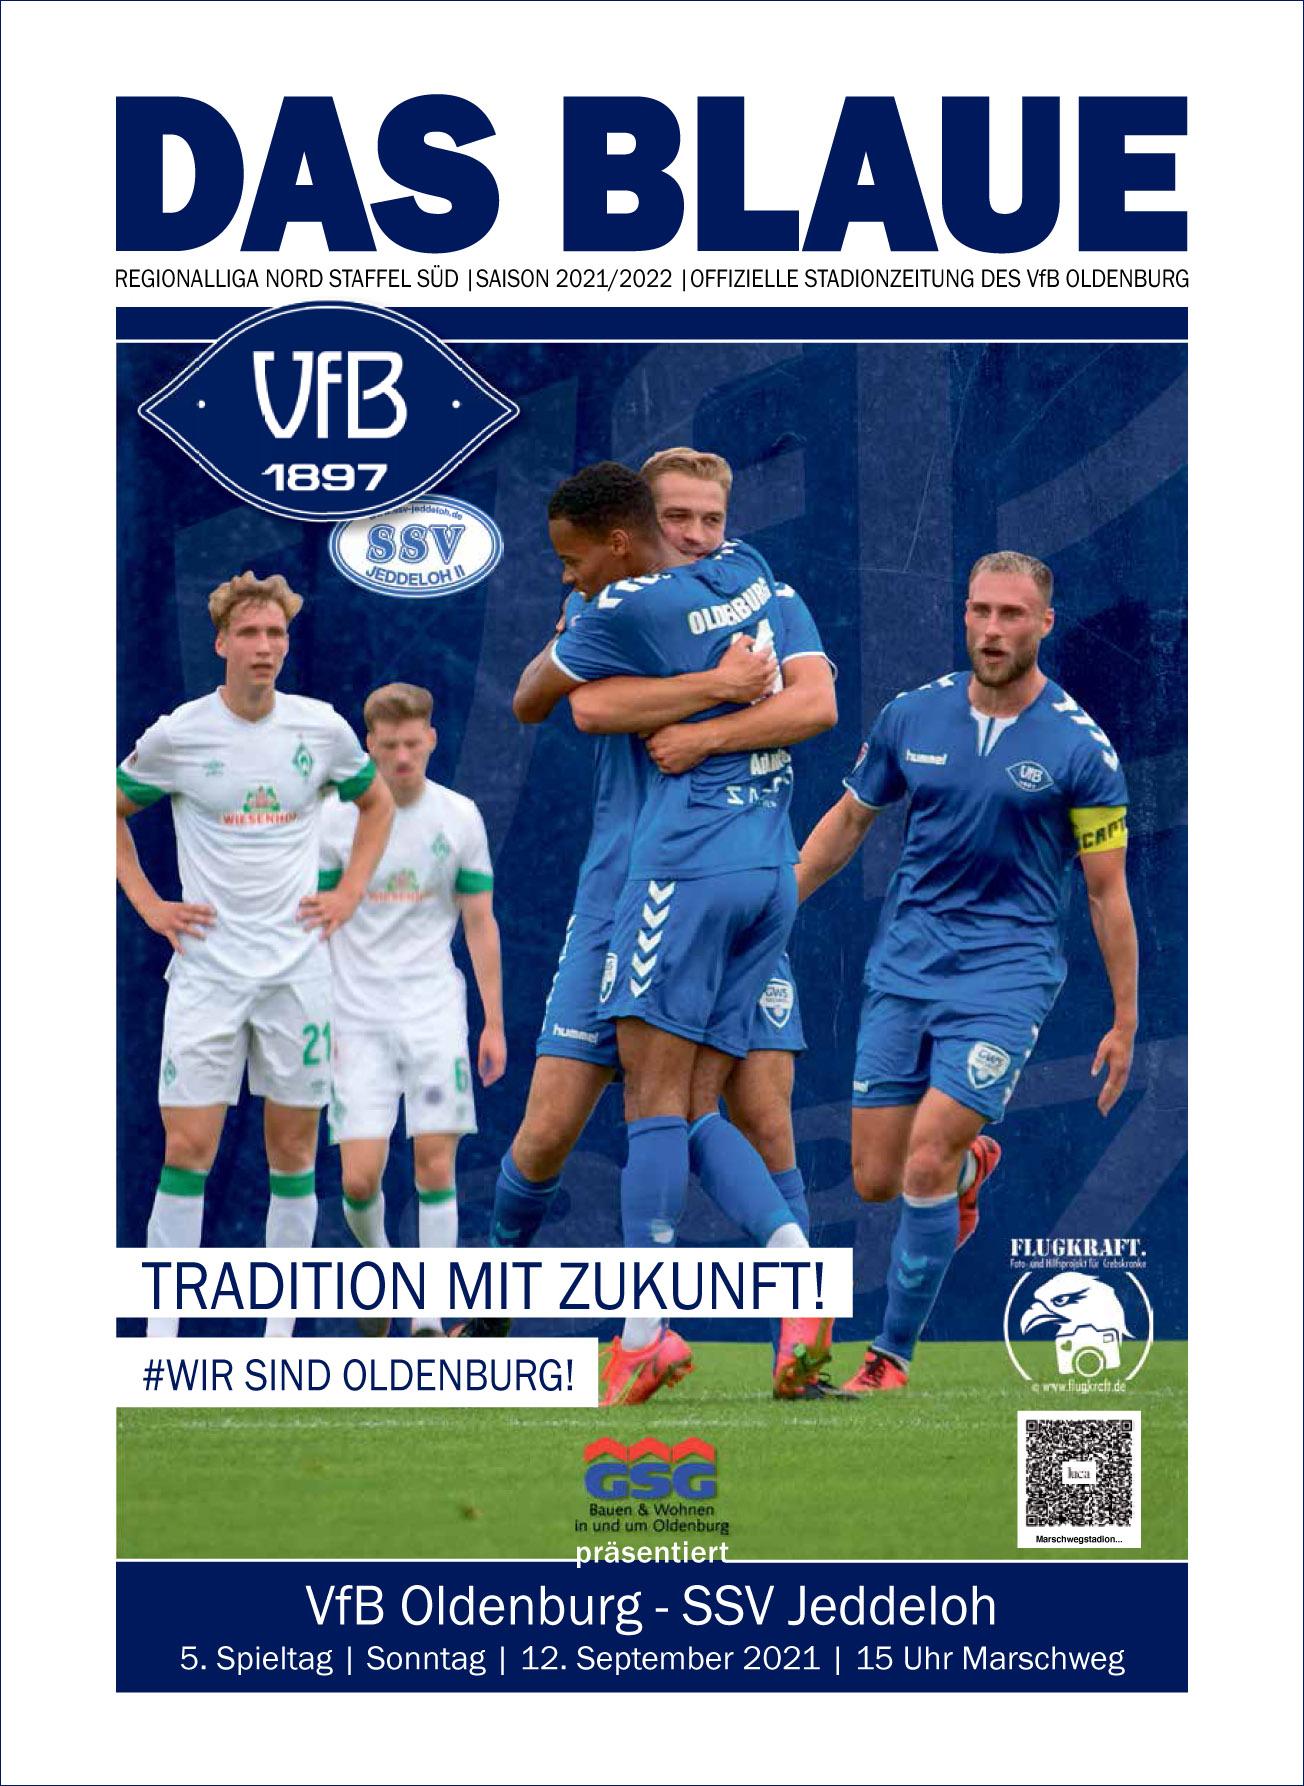 https://vfb-oldenburg.de/wp-content/uploads/2021/09/VFB_Oldenburg_5_Spieltag_2021_2022-1.jpg